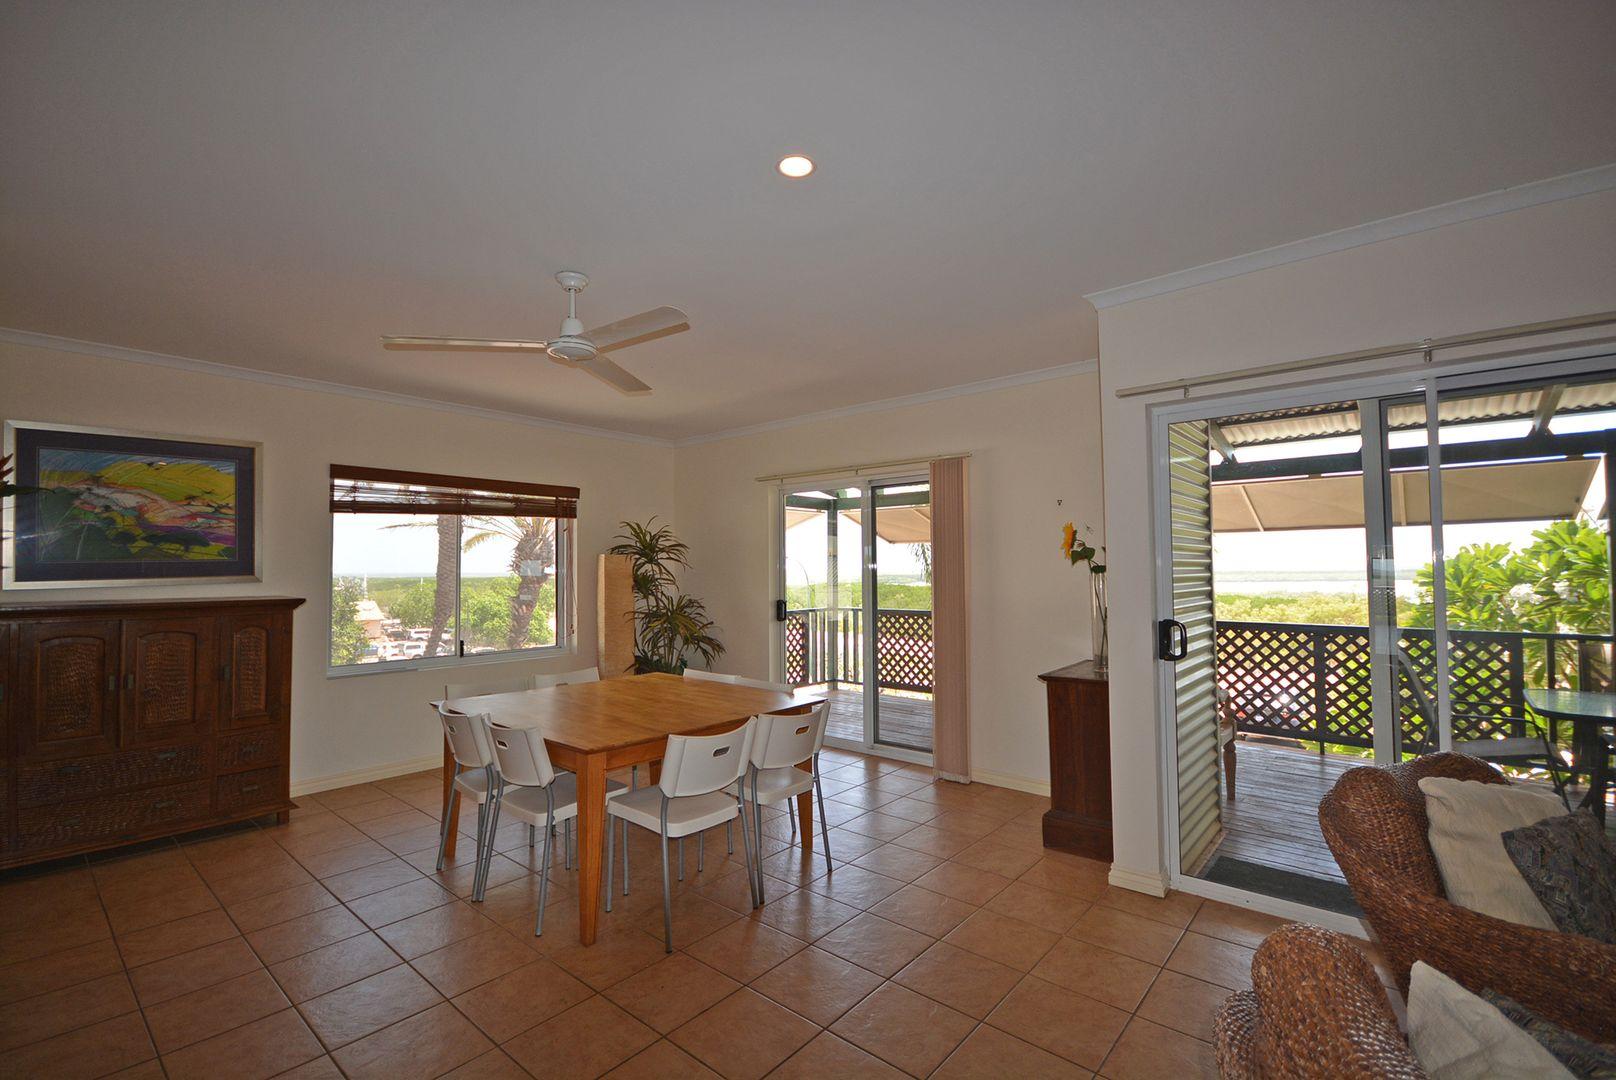 3/46 Dampier Terrace, Broome WA 6725, Image 0